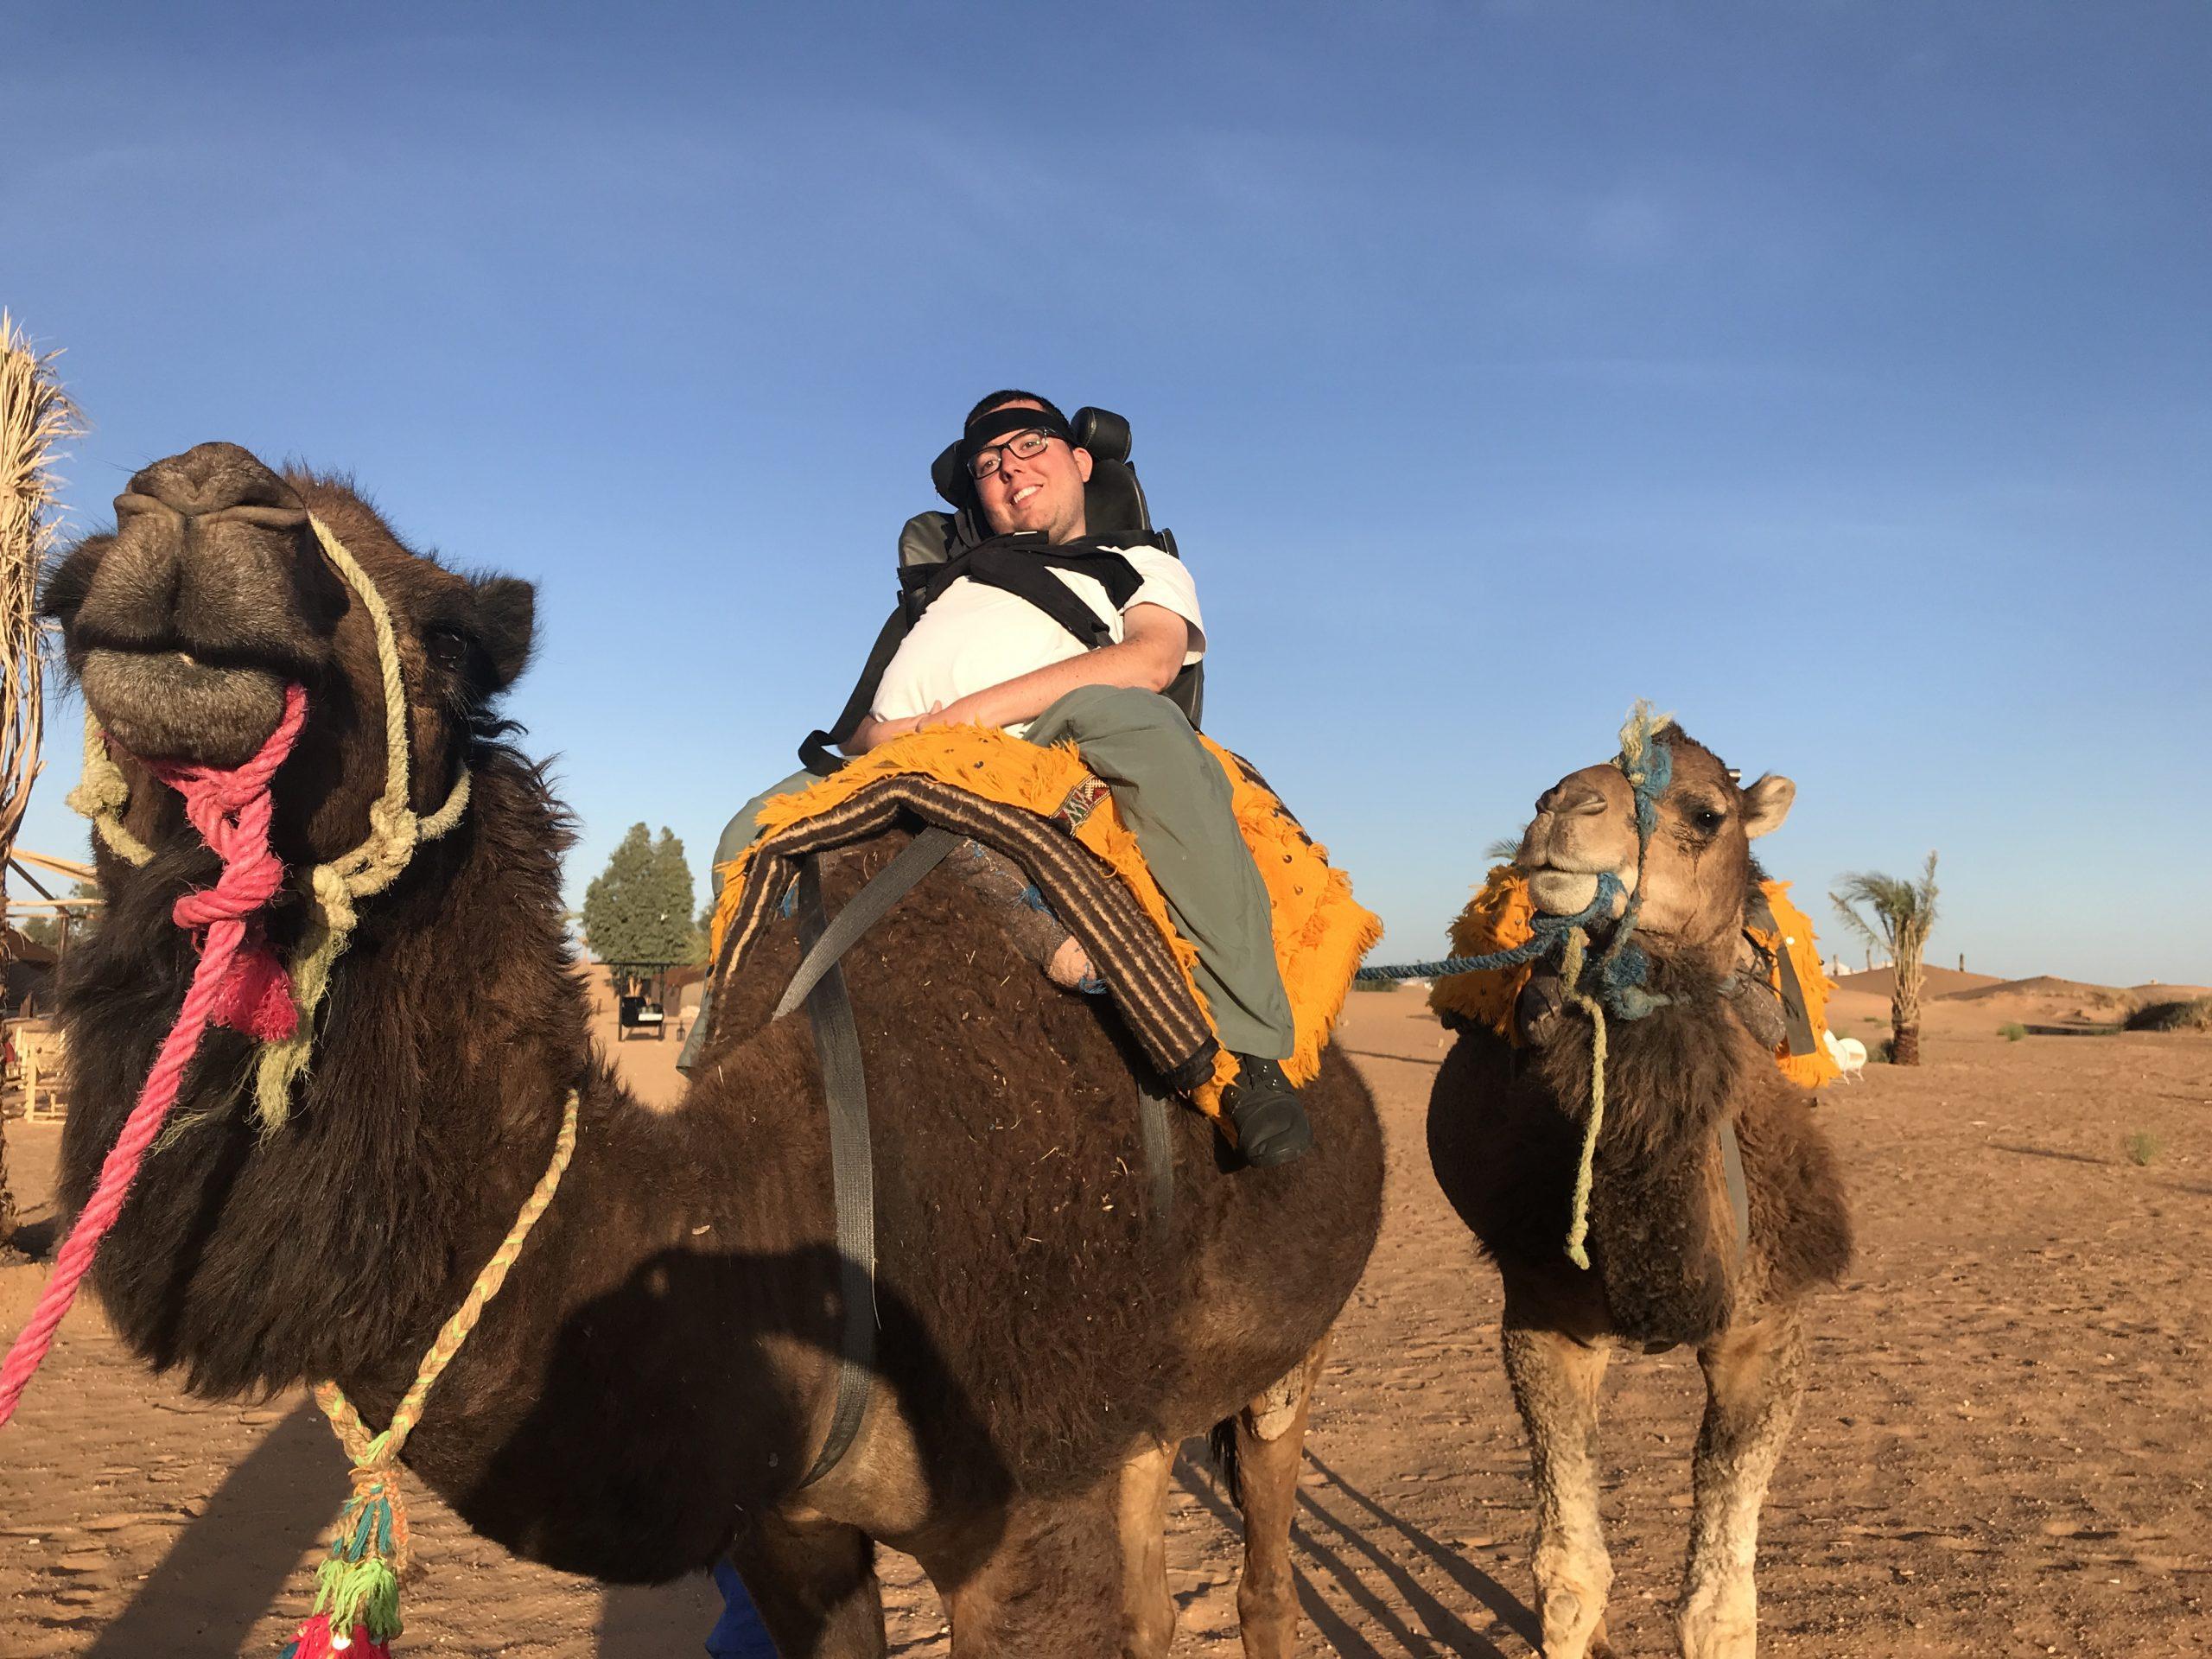 Cory Lee on camel